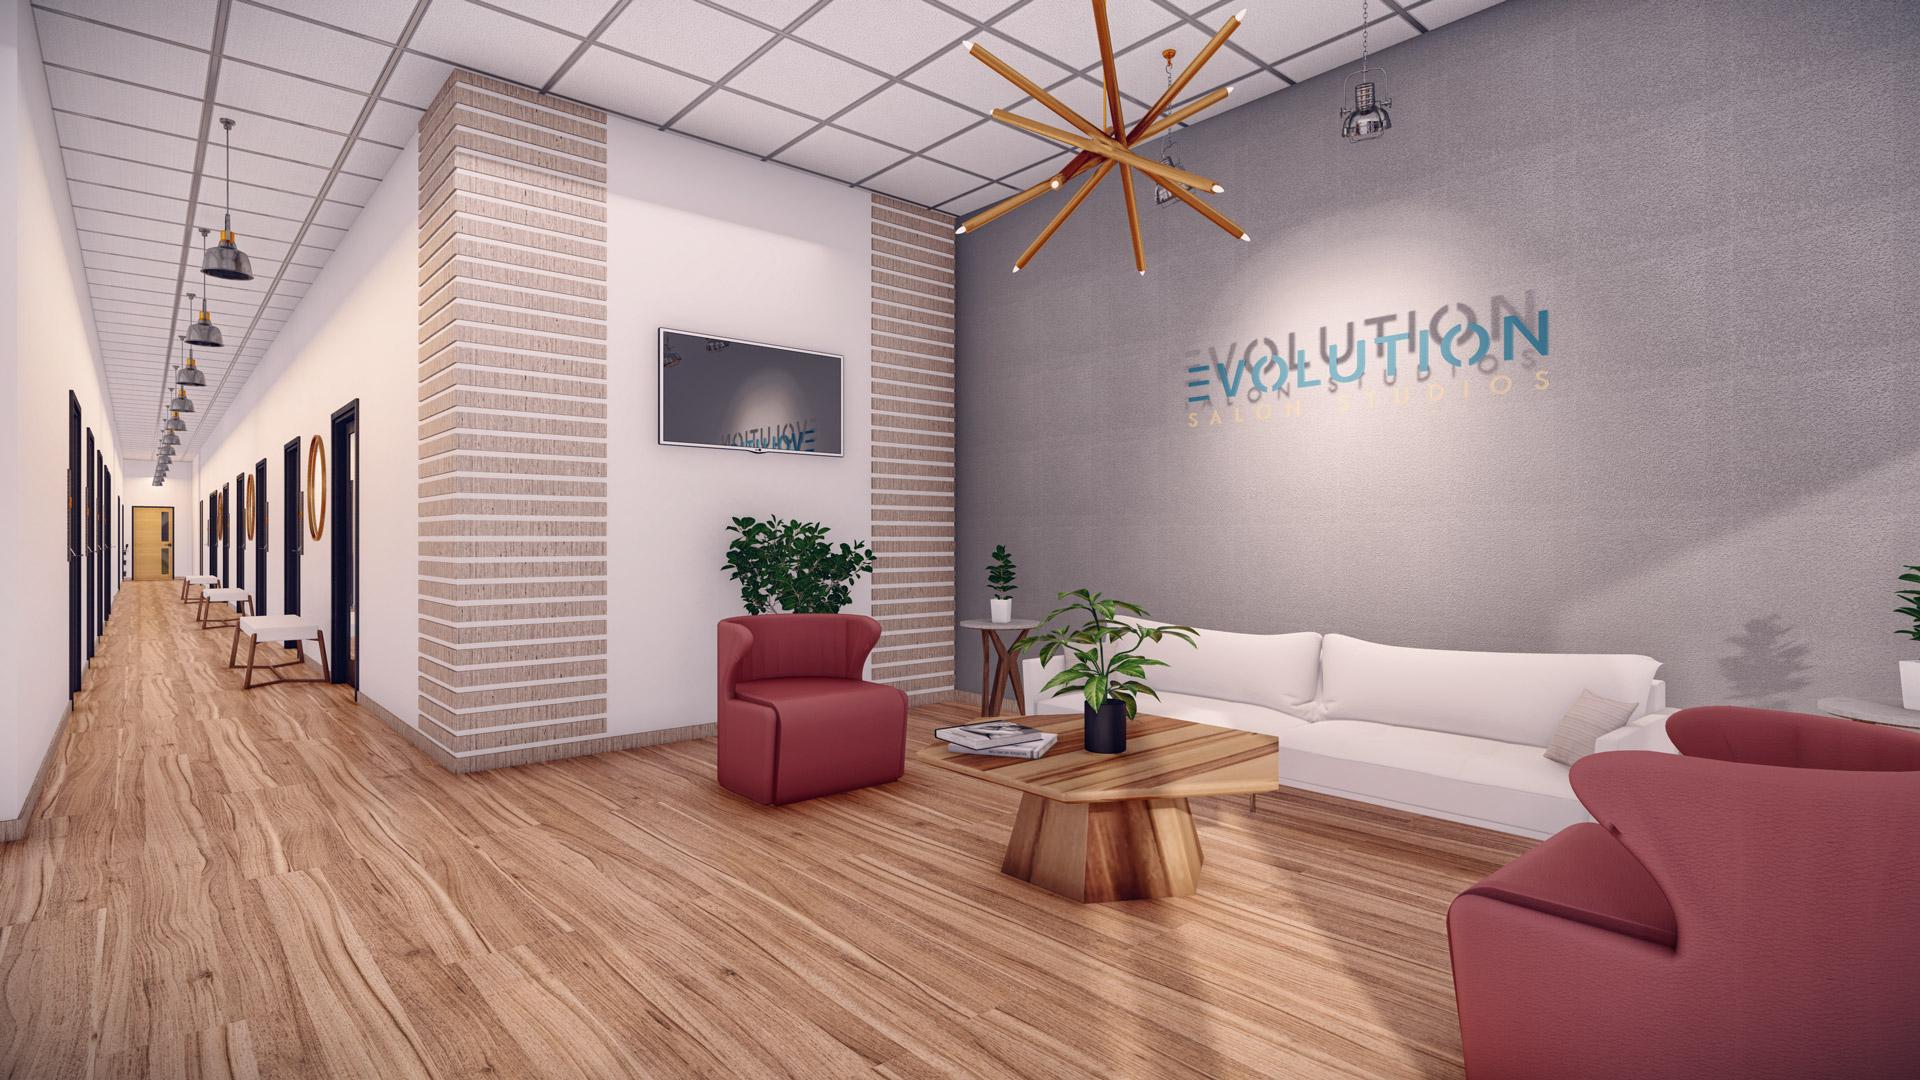 Evolution Salon Studios - Lobby